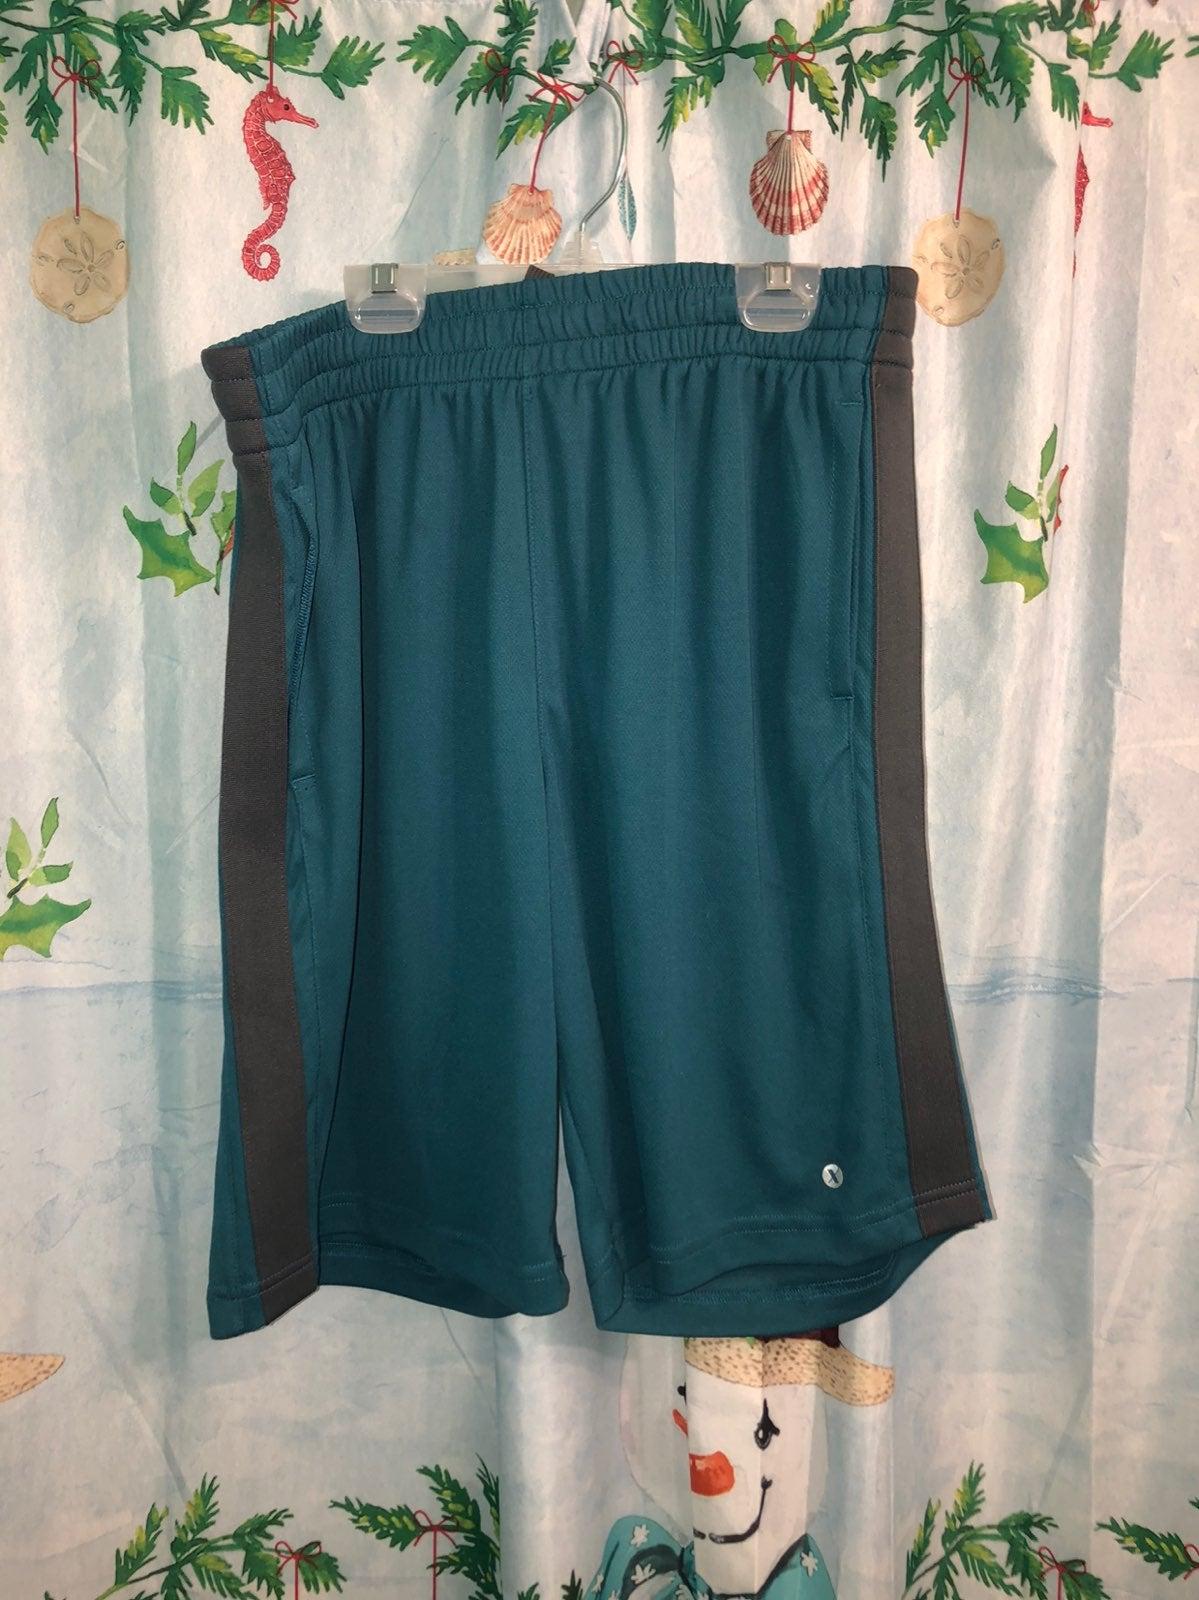 Brand new blue gym shorts.